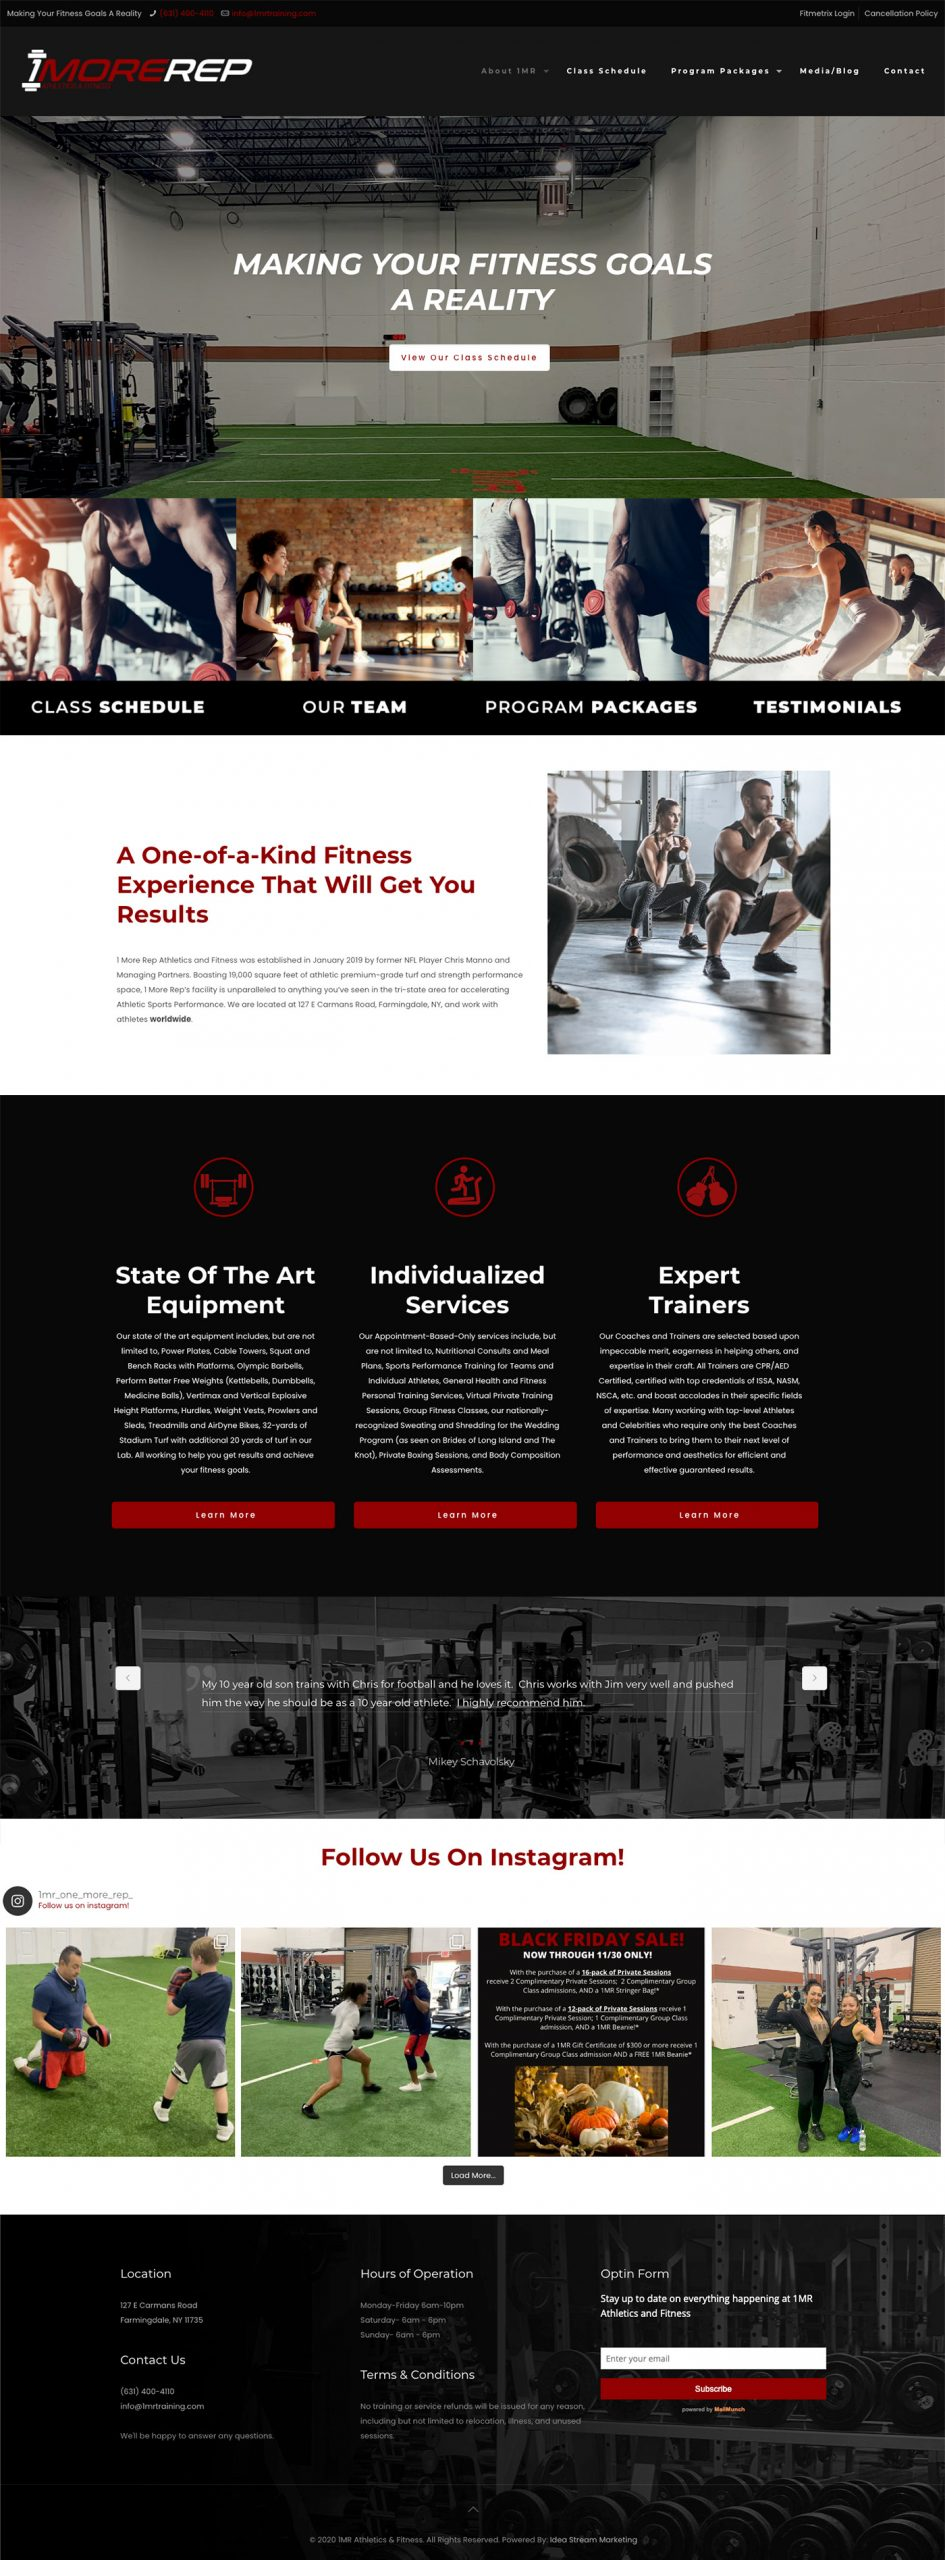 1 More Rep Athletics & Fitness